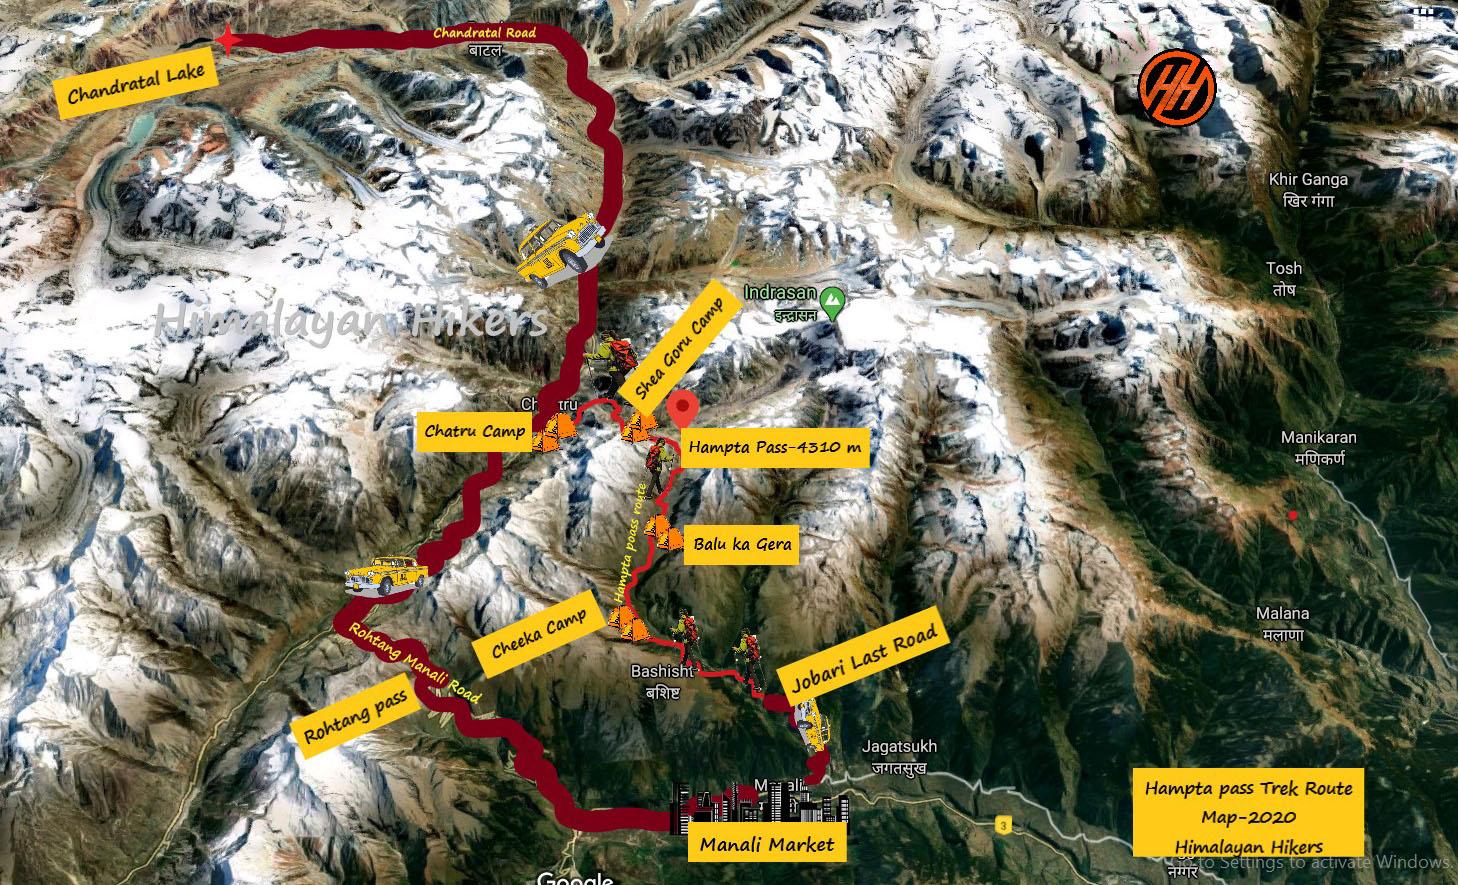 Manali to Hampta Pass Route Map